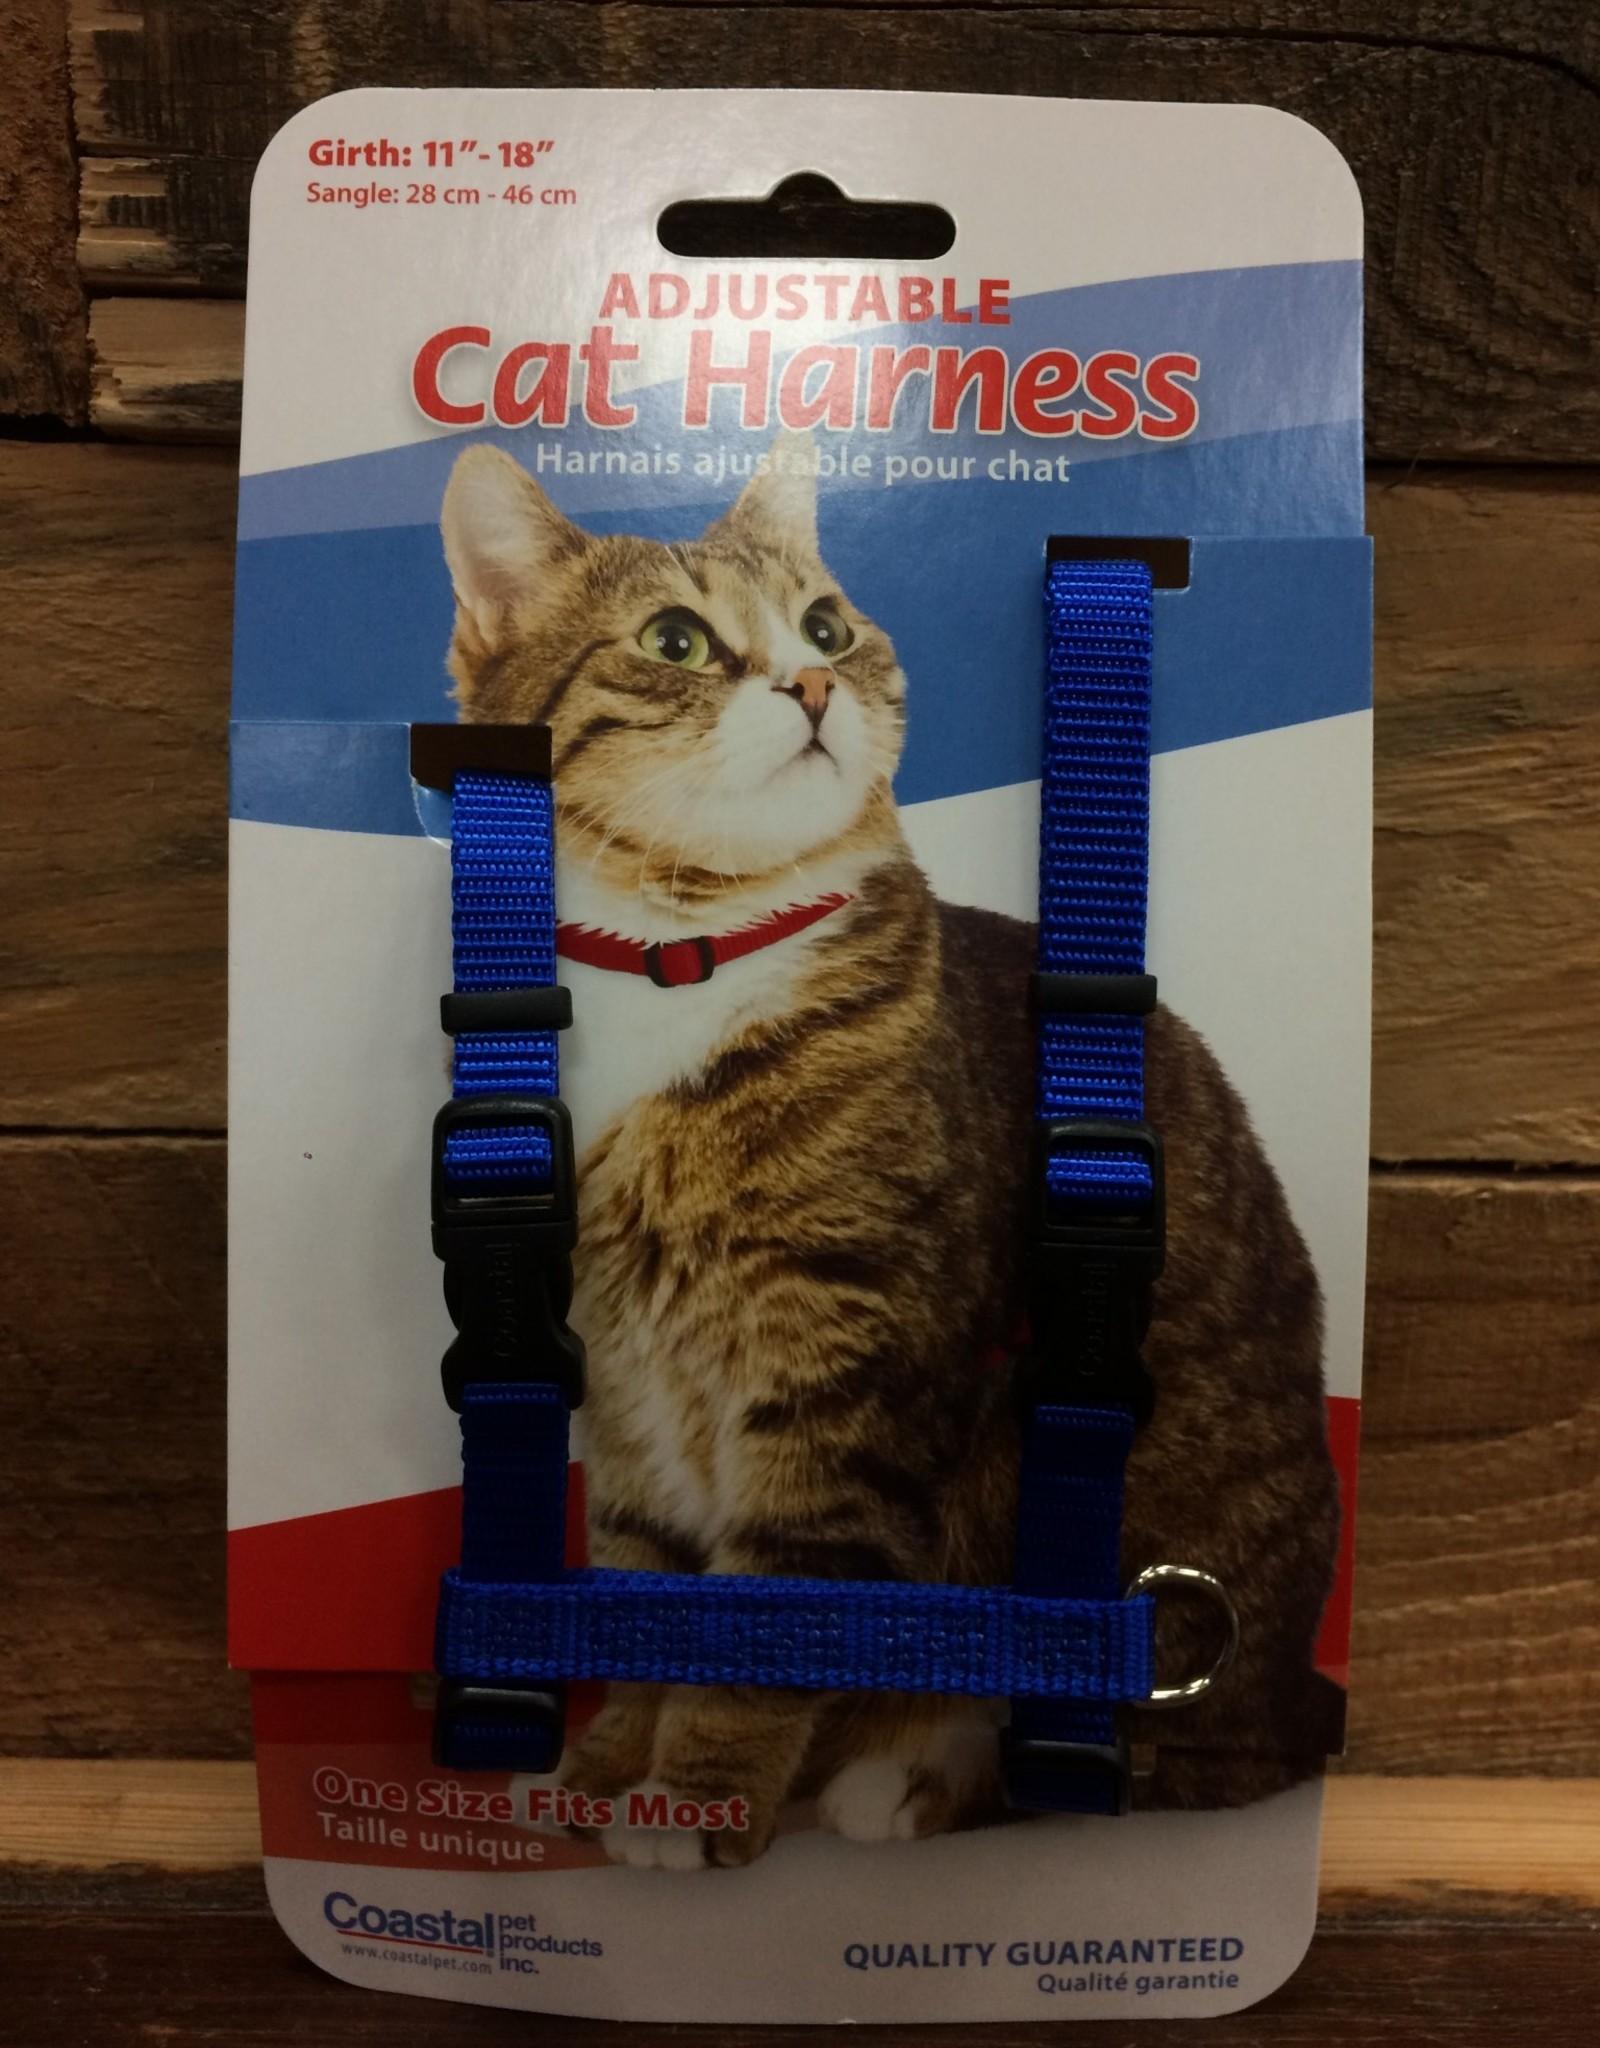 Coastal Pet Products Coastal Cat adjustable Harnesses